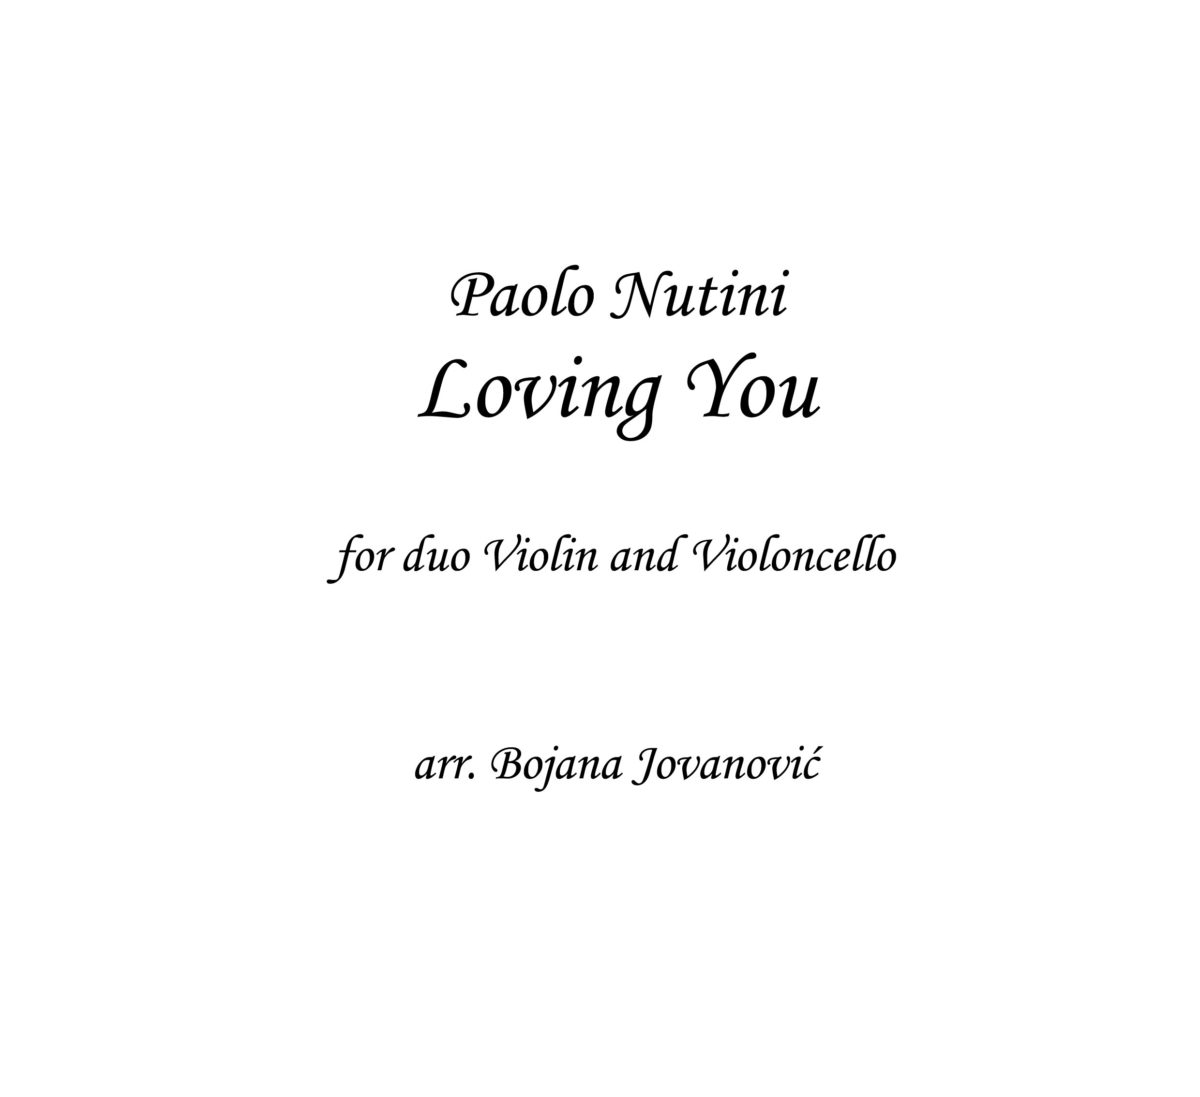 Loving You (Paolo Nutini) - Sheet Music